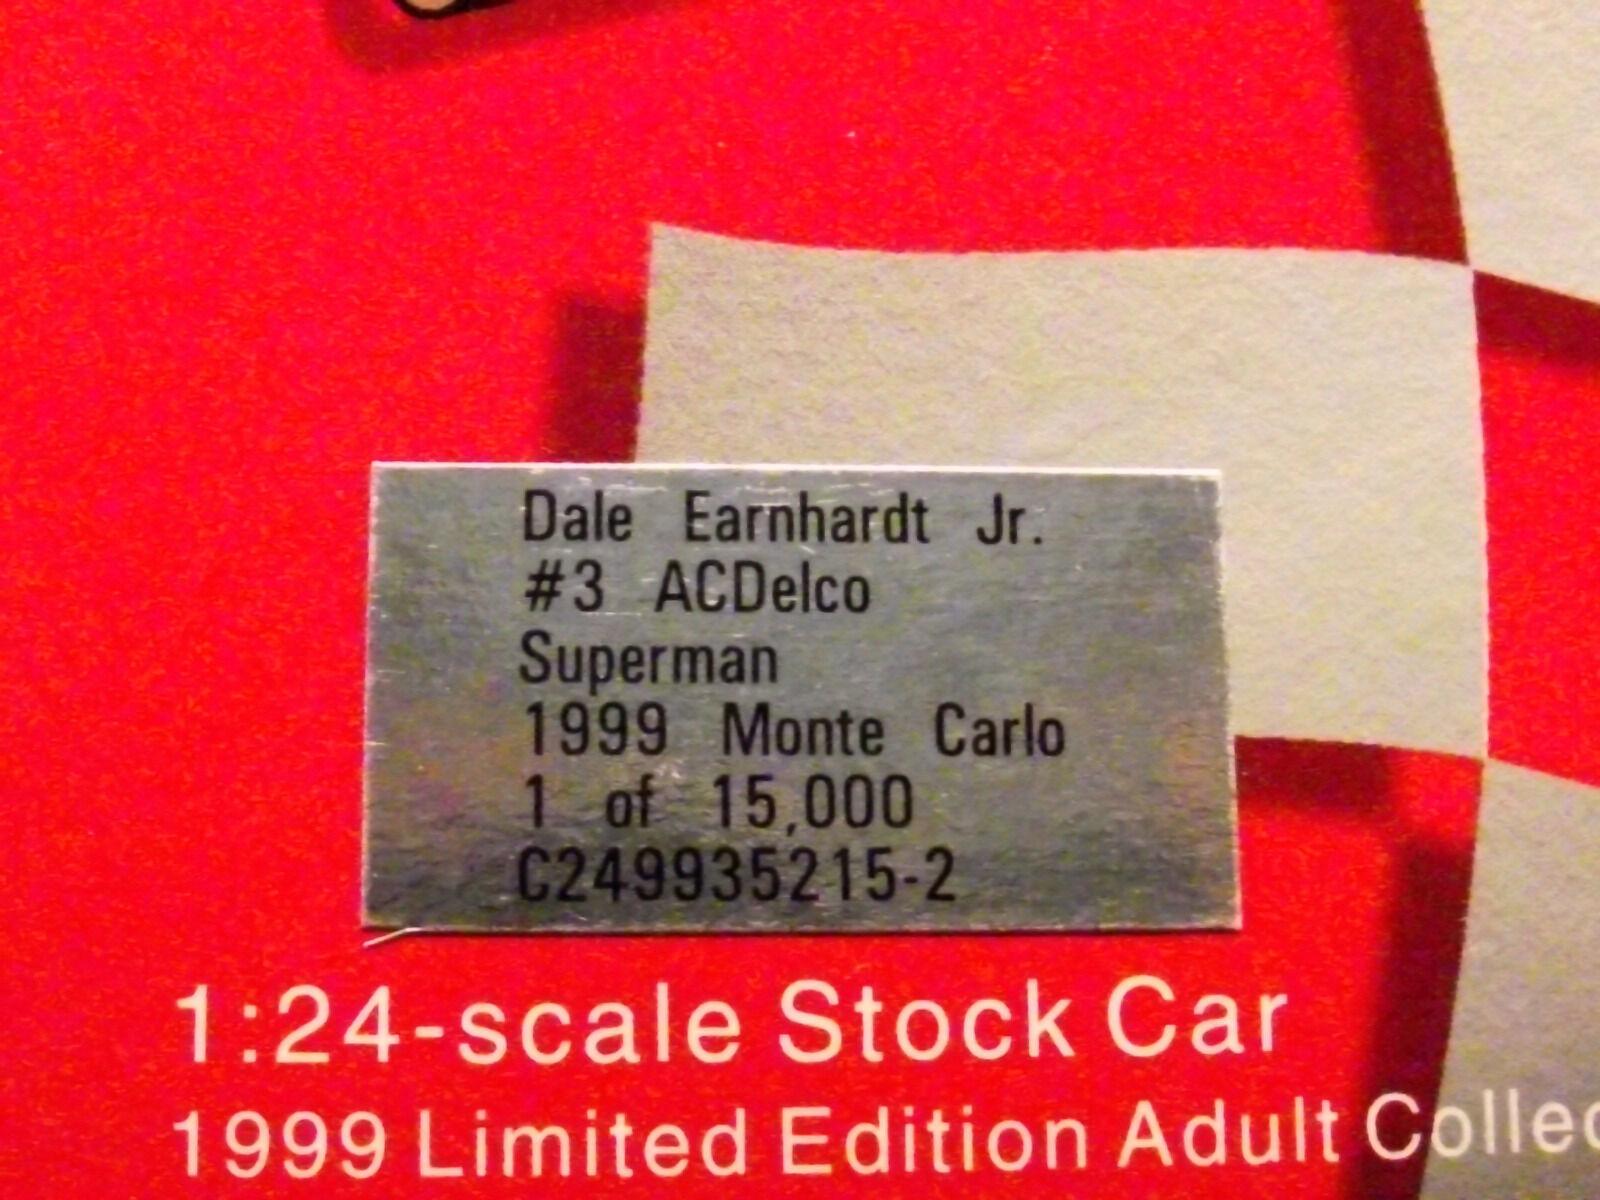 Dale Earndhardt Jr. AC Delco 1999 Monte Carlo Bank- Superman